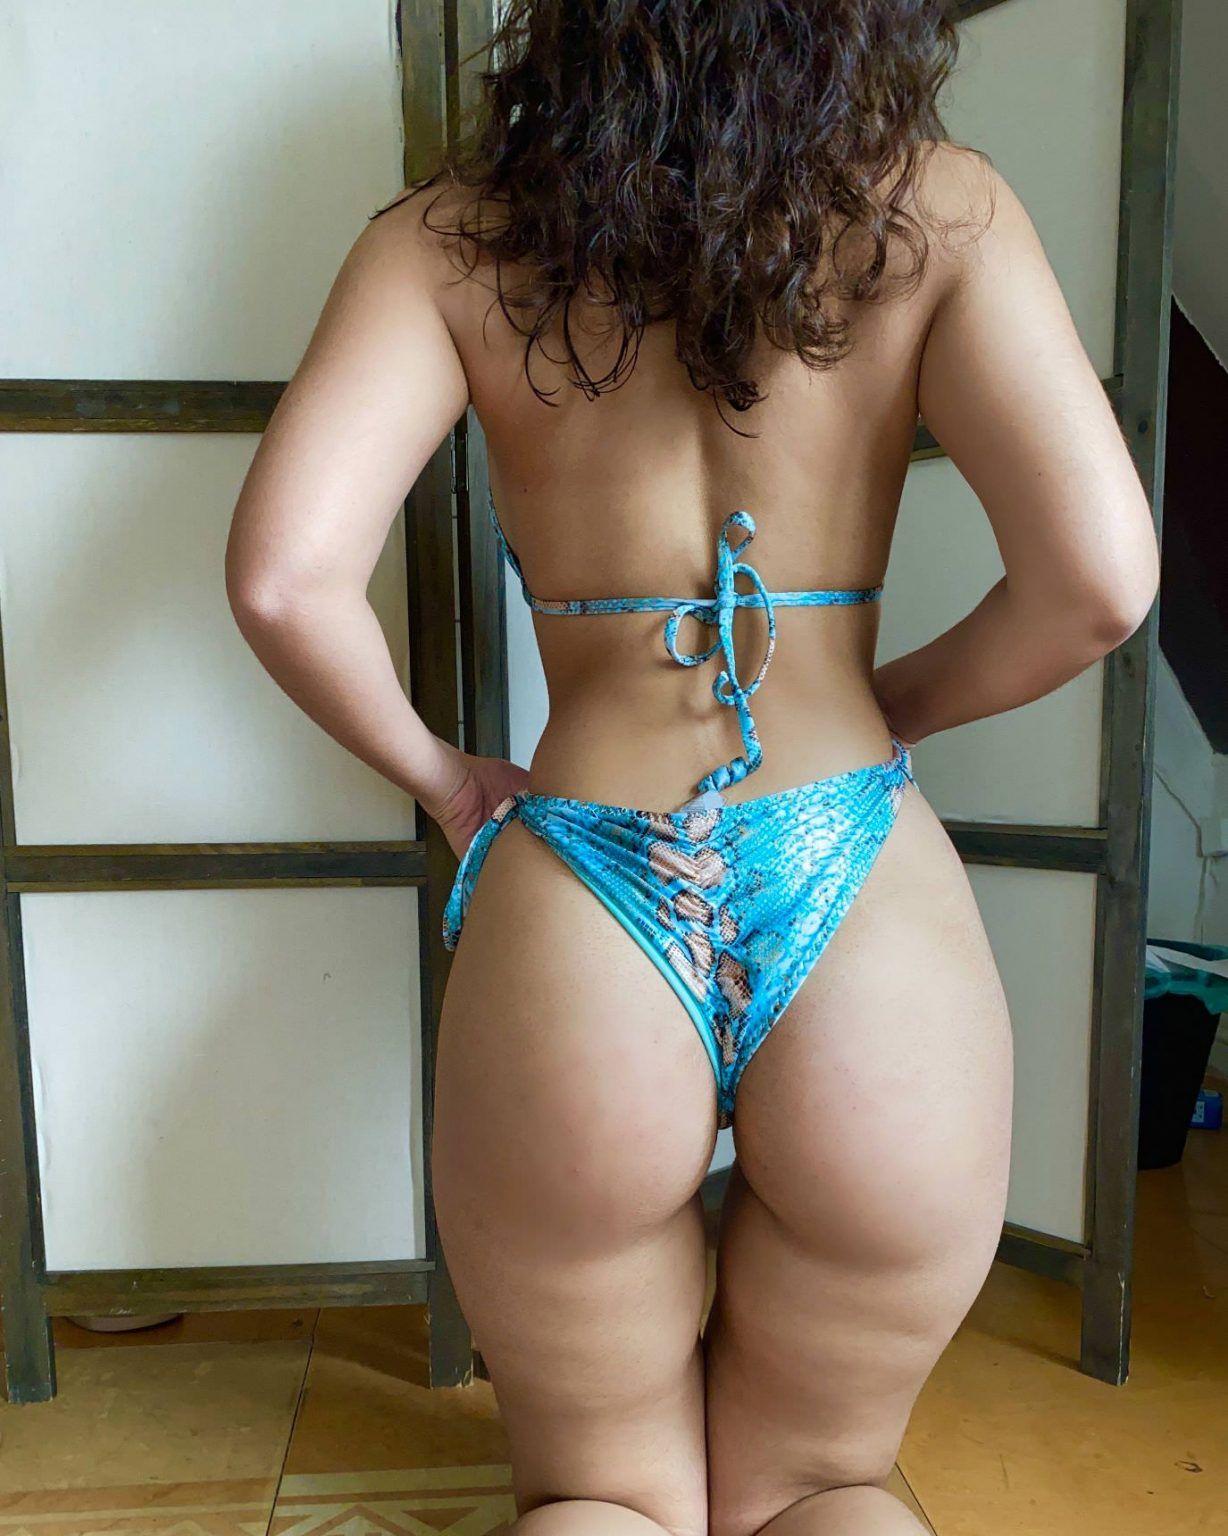 LunaSilverX Nude Onlyfans 2